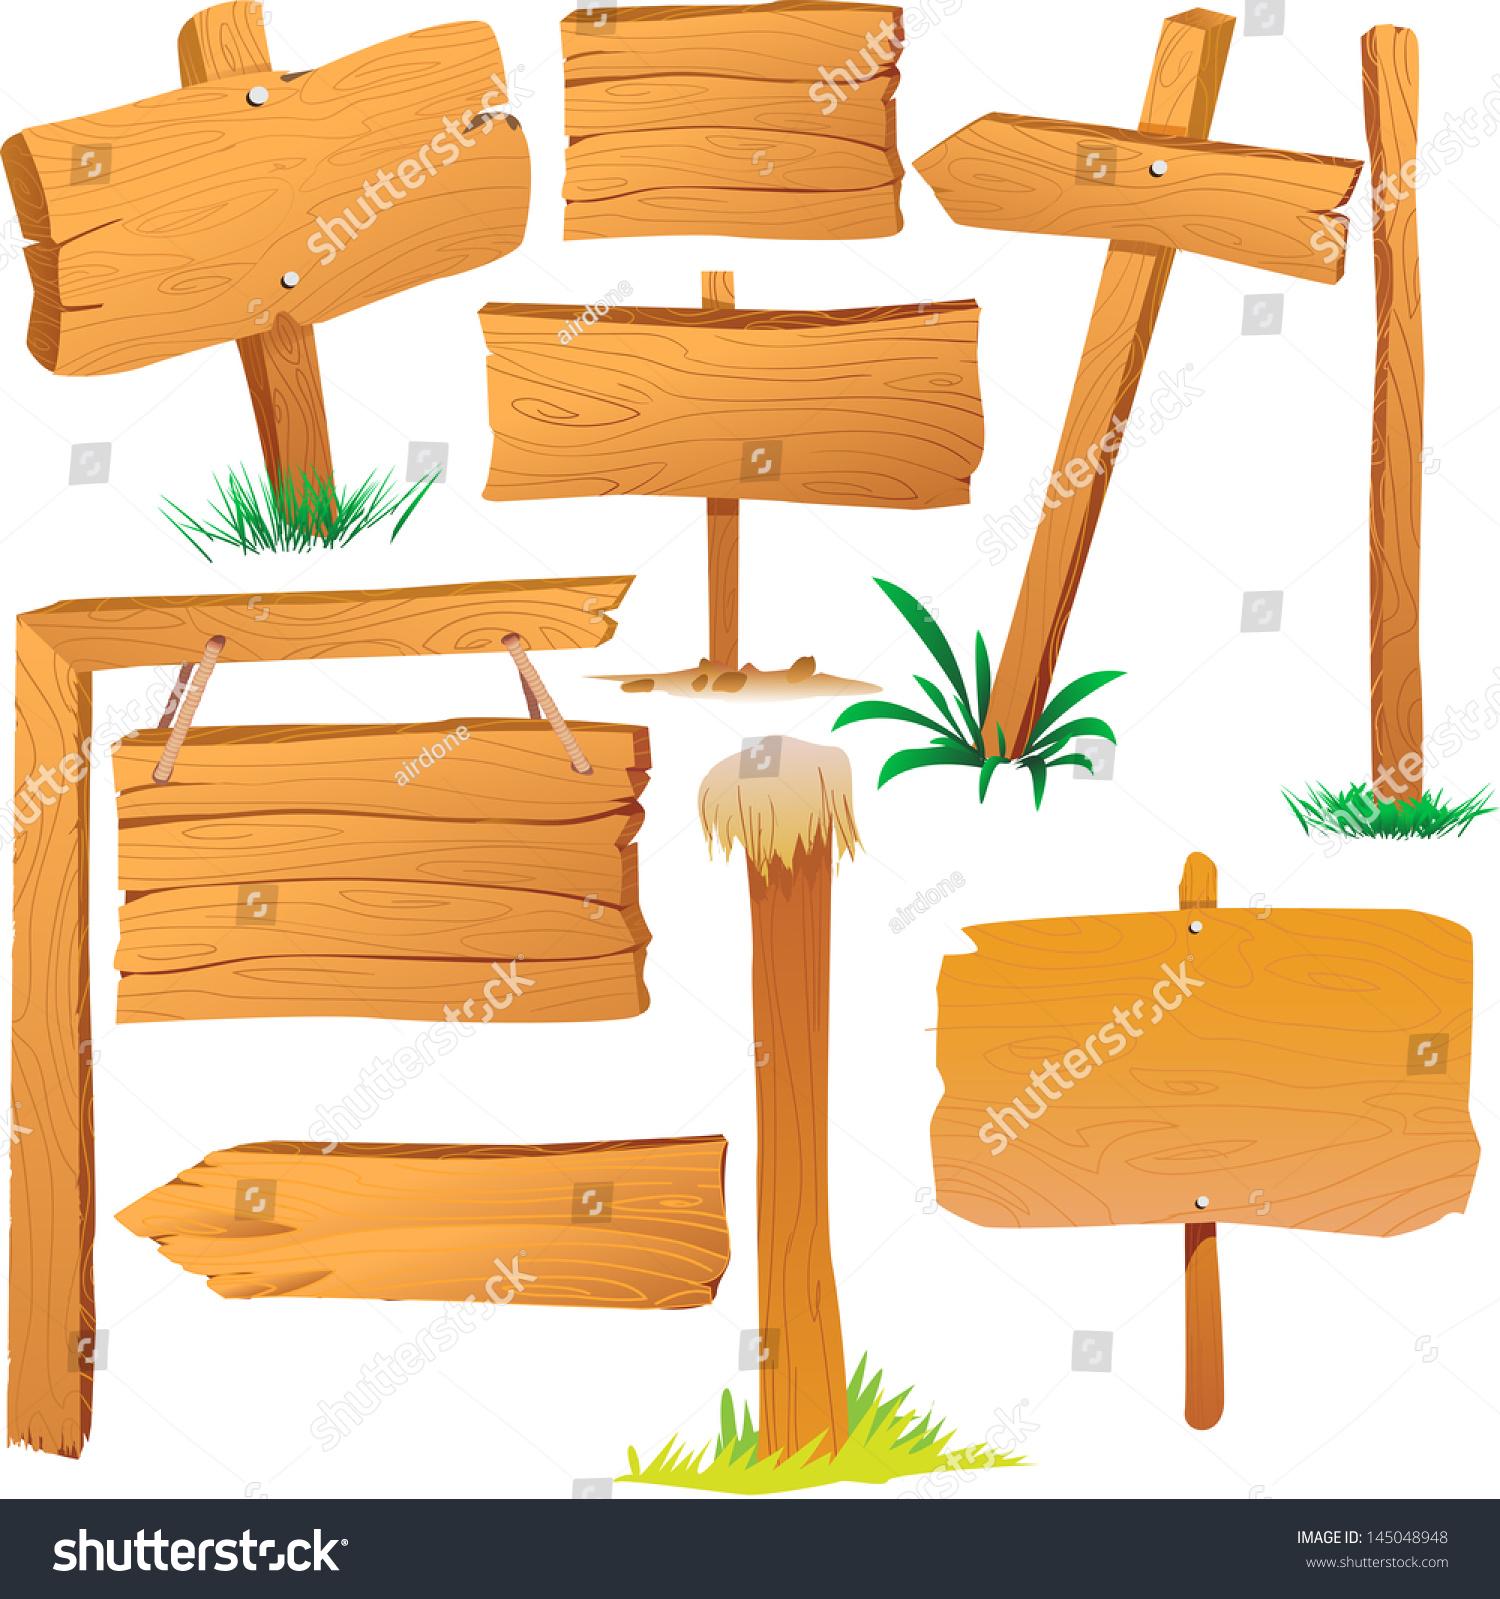 Cartoon Wood Board ~ Wooden sign boards cartoon style stock vector